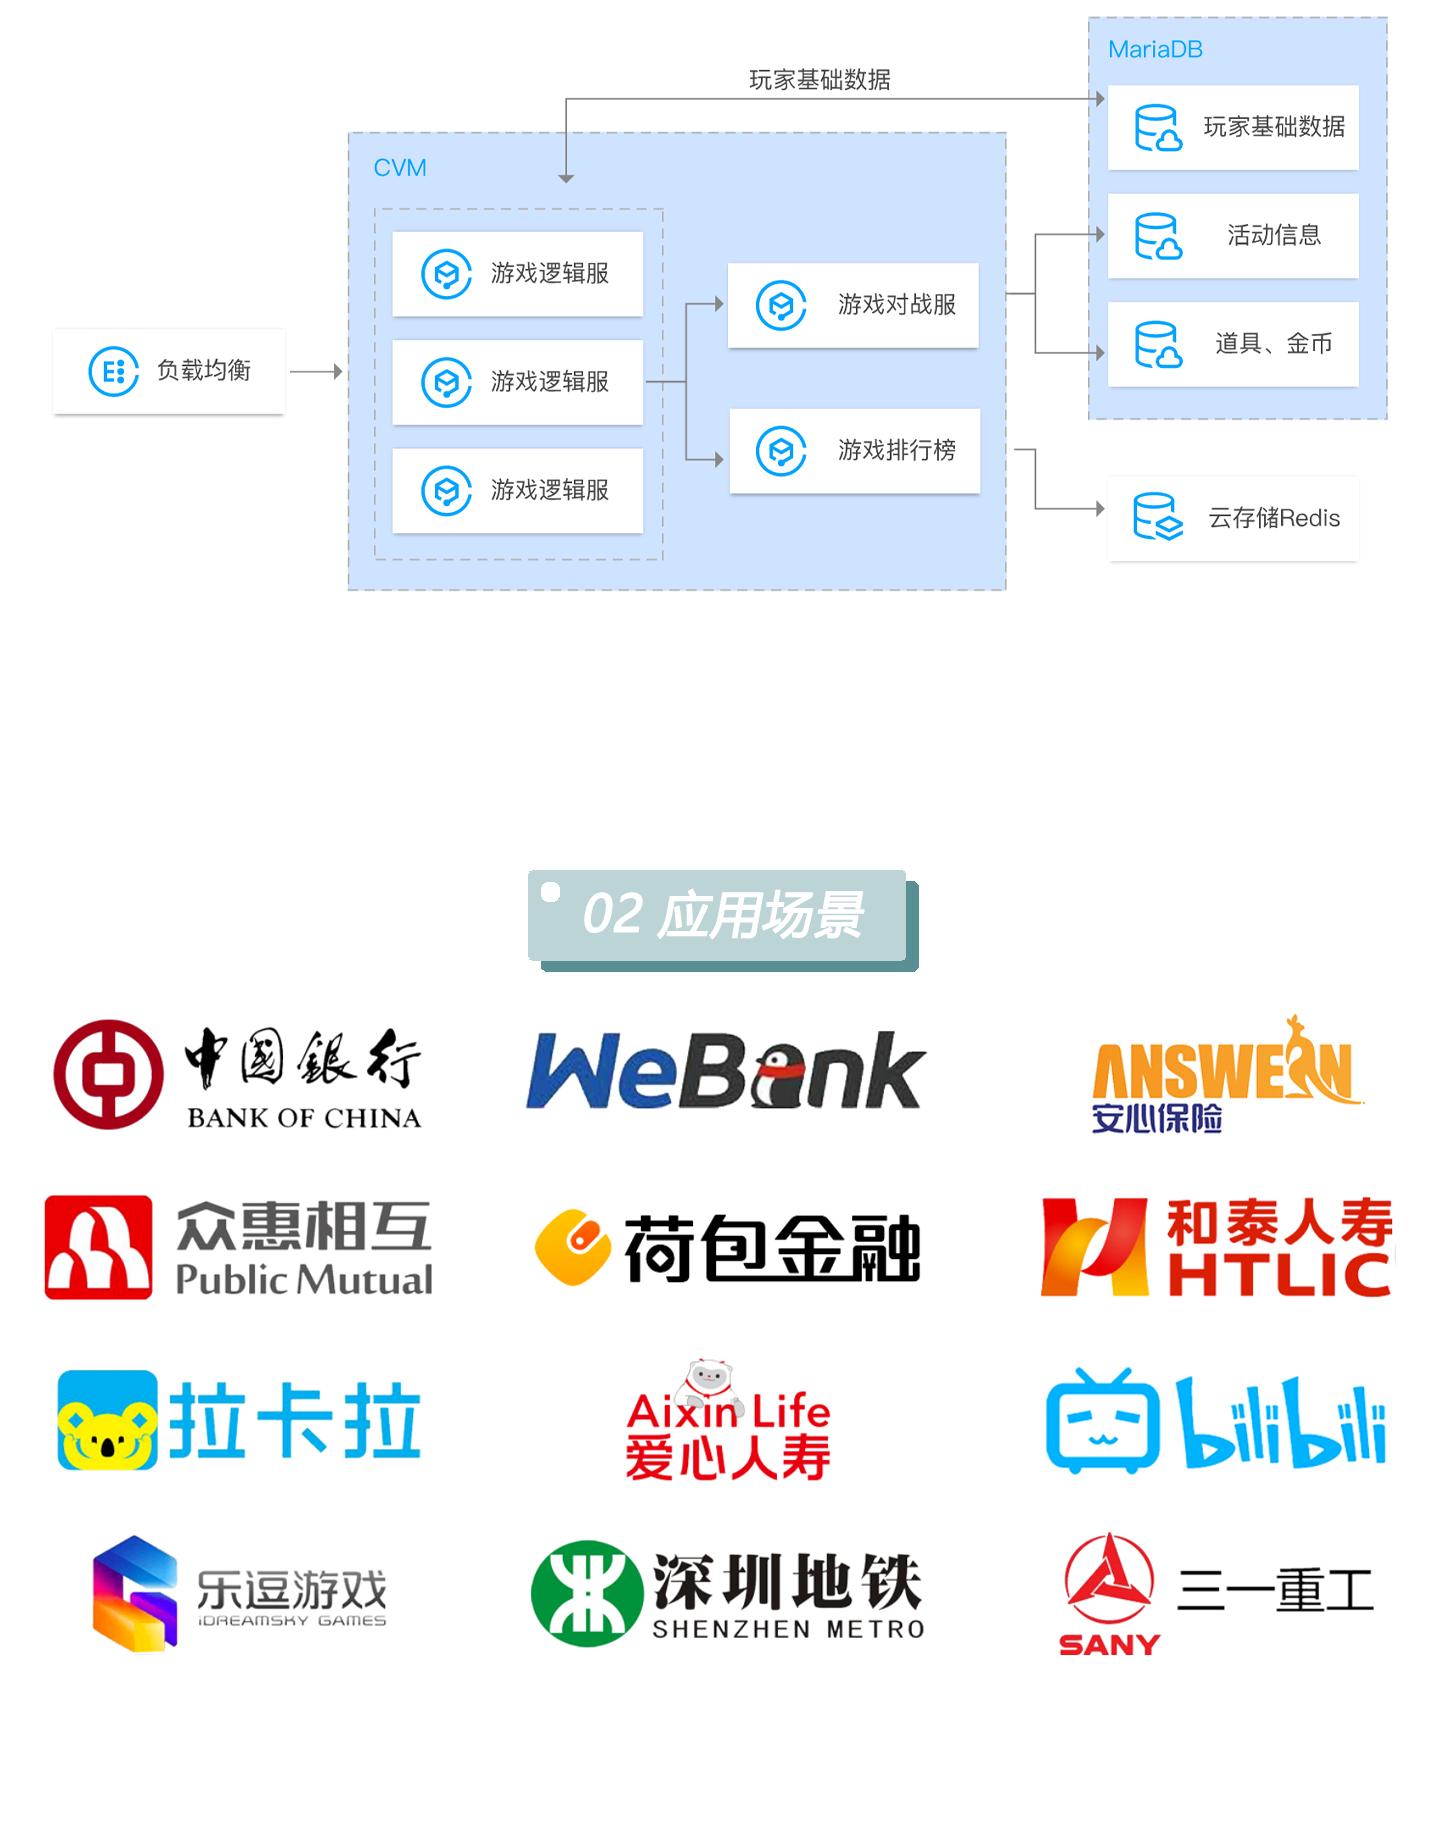 云数据库-TencentDB-for-MariaDB-1440_06.jpg